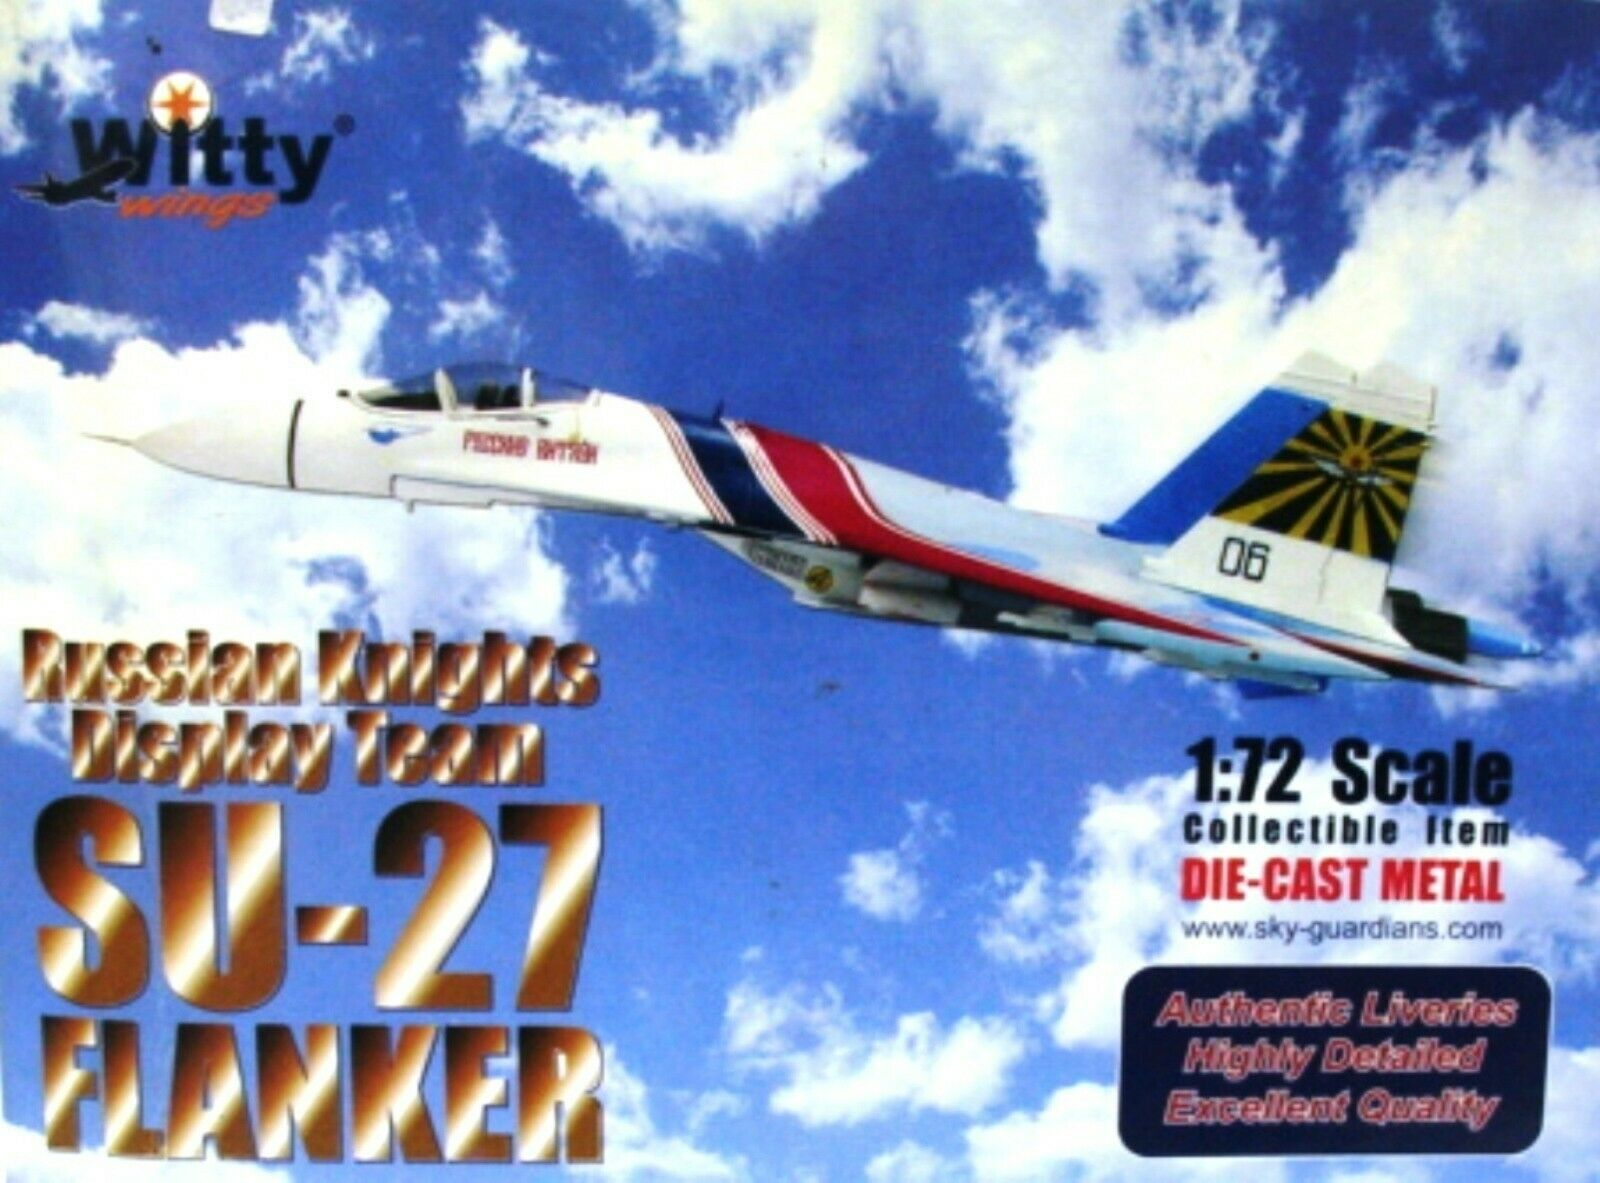 EXTRA RARE osipovič SUCHOJ Su-27 Flanker-B Knight Riders CCCP 1988 NUOVO CON SCATOLA 1 72 Witty Wings